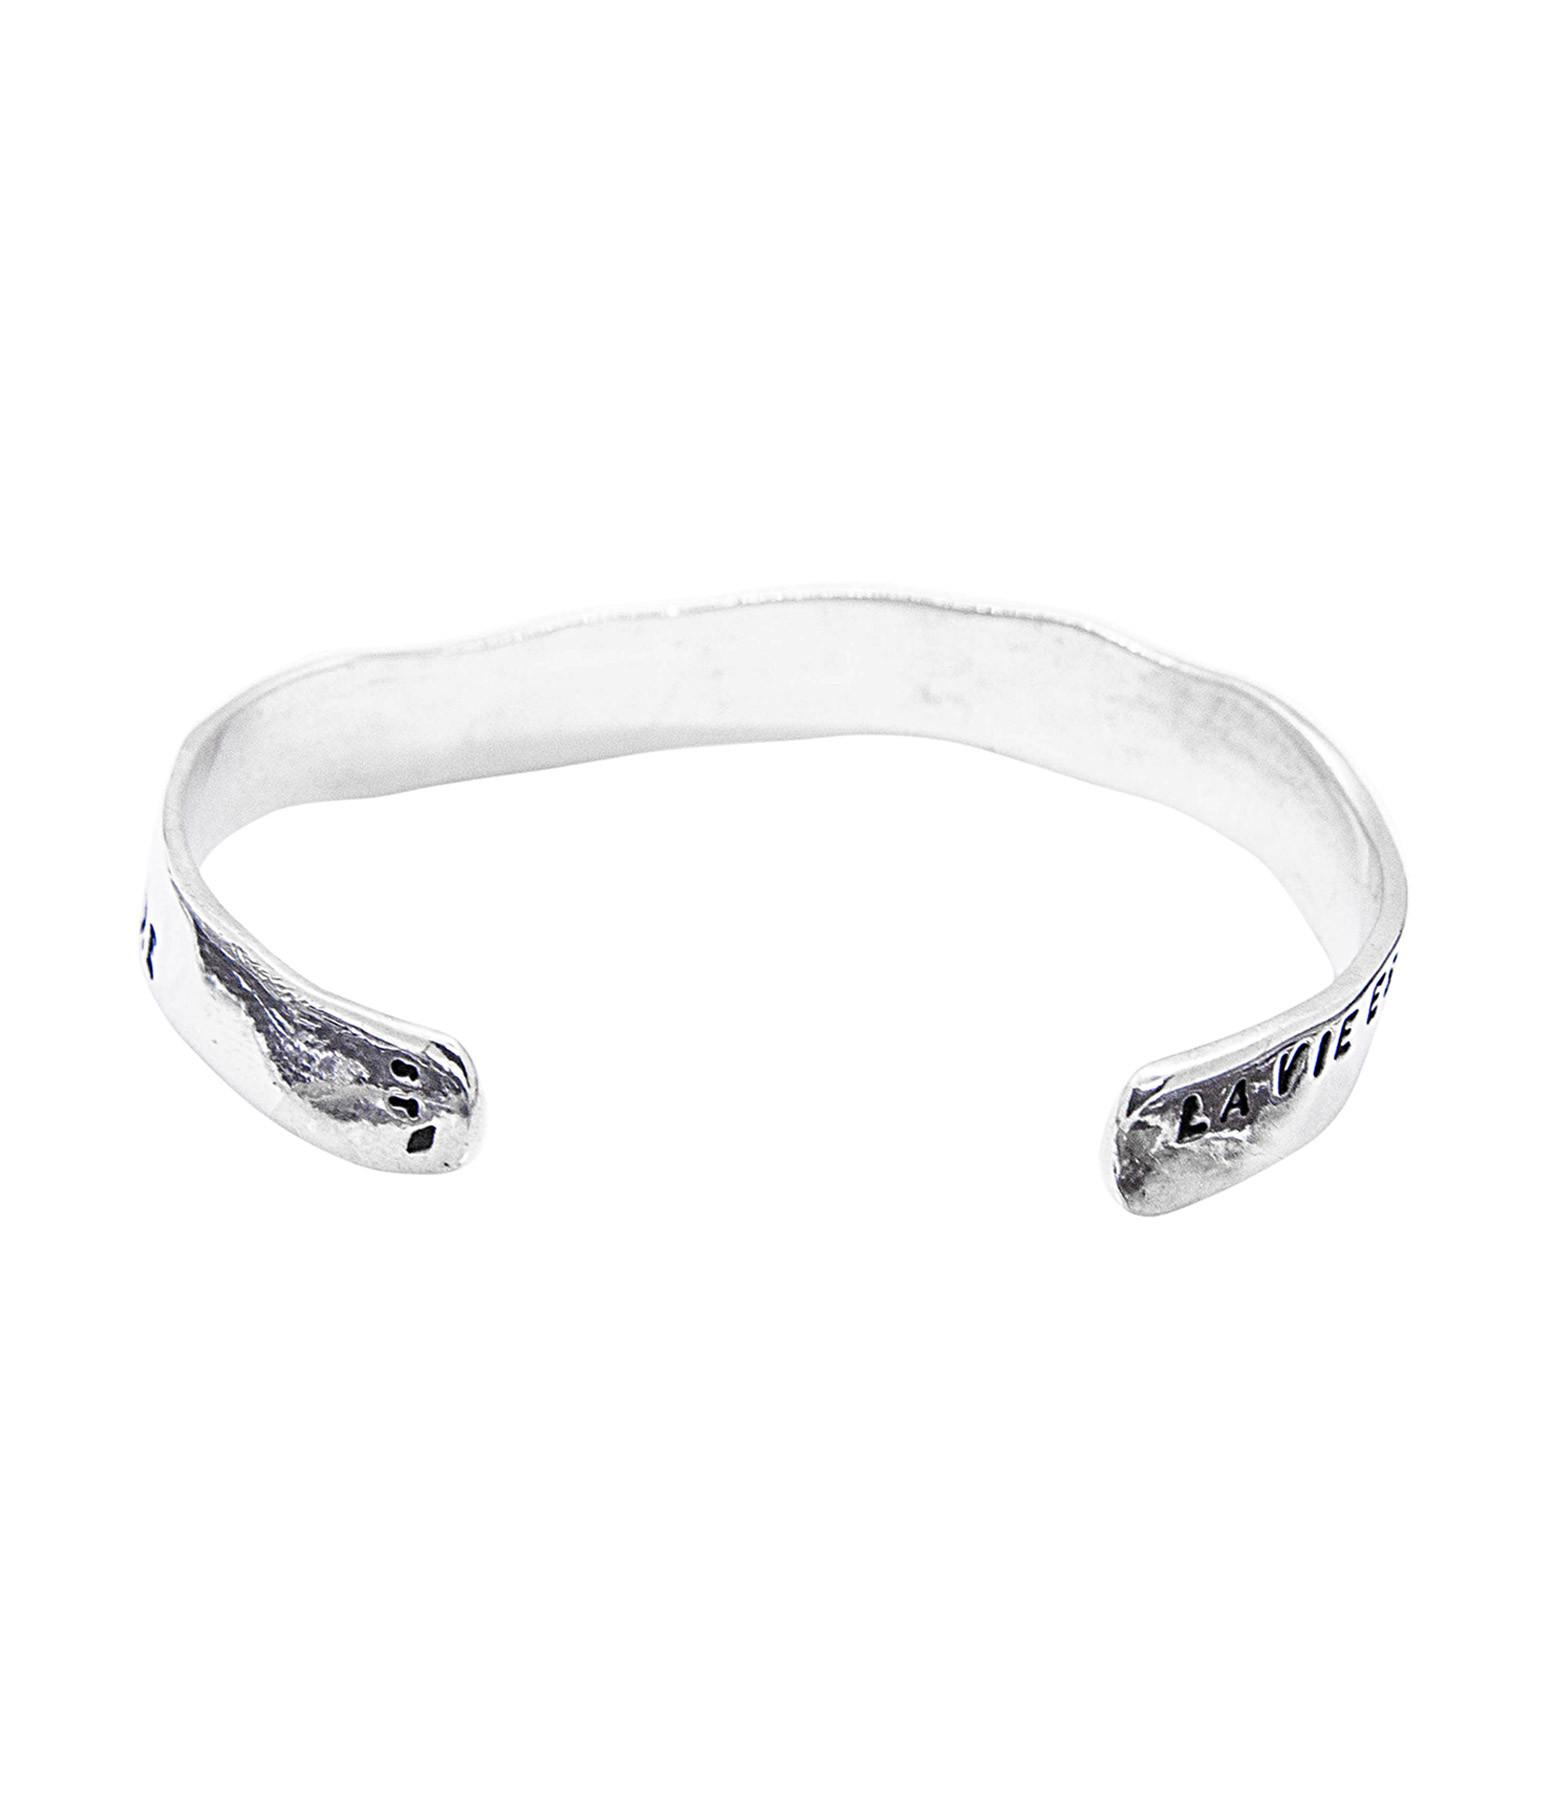 SERGE THORAVAL - Bracelet Rêve Bis Argent